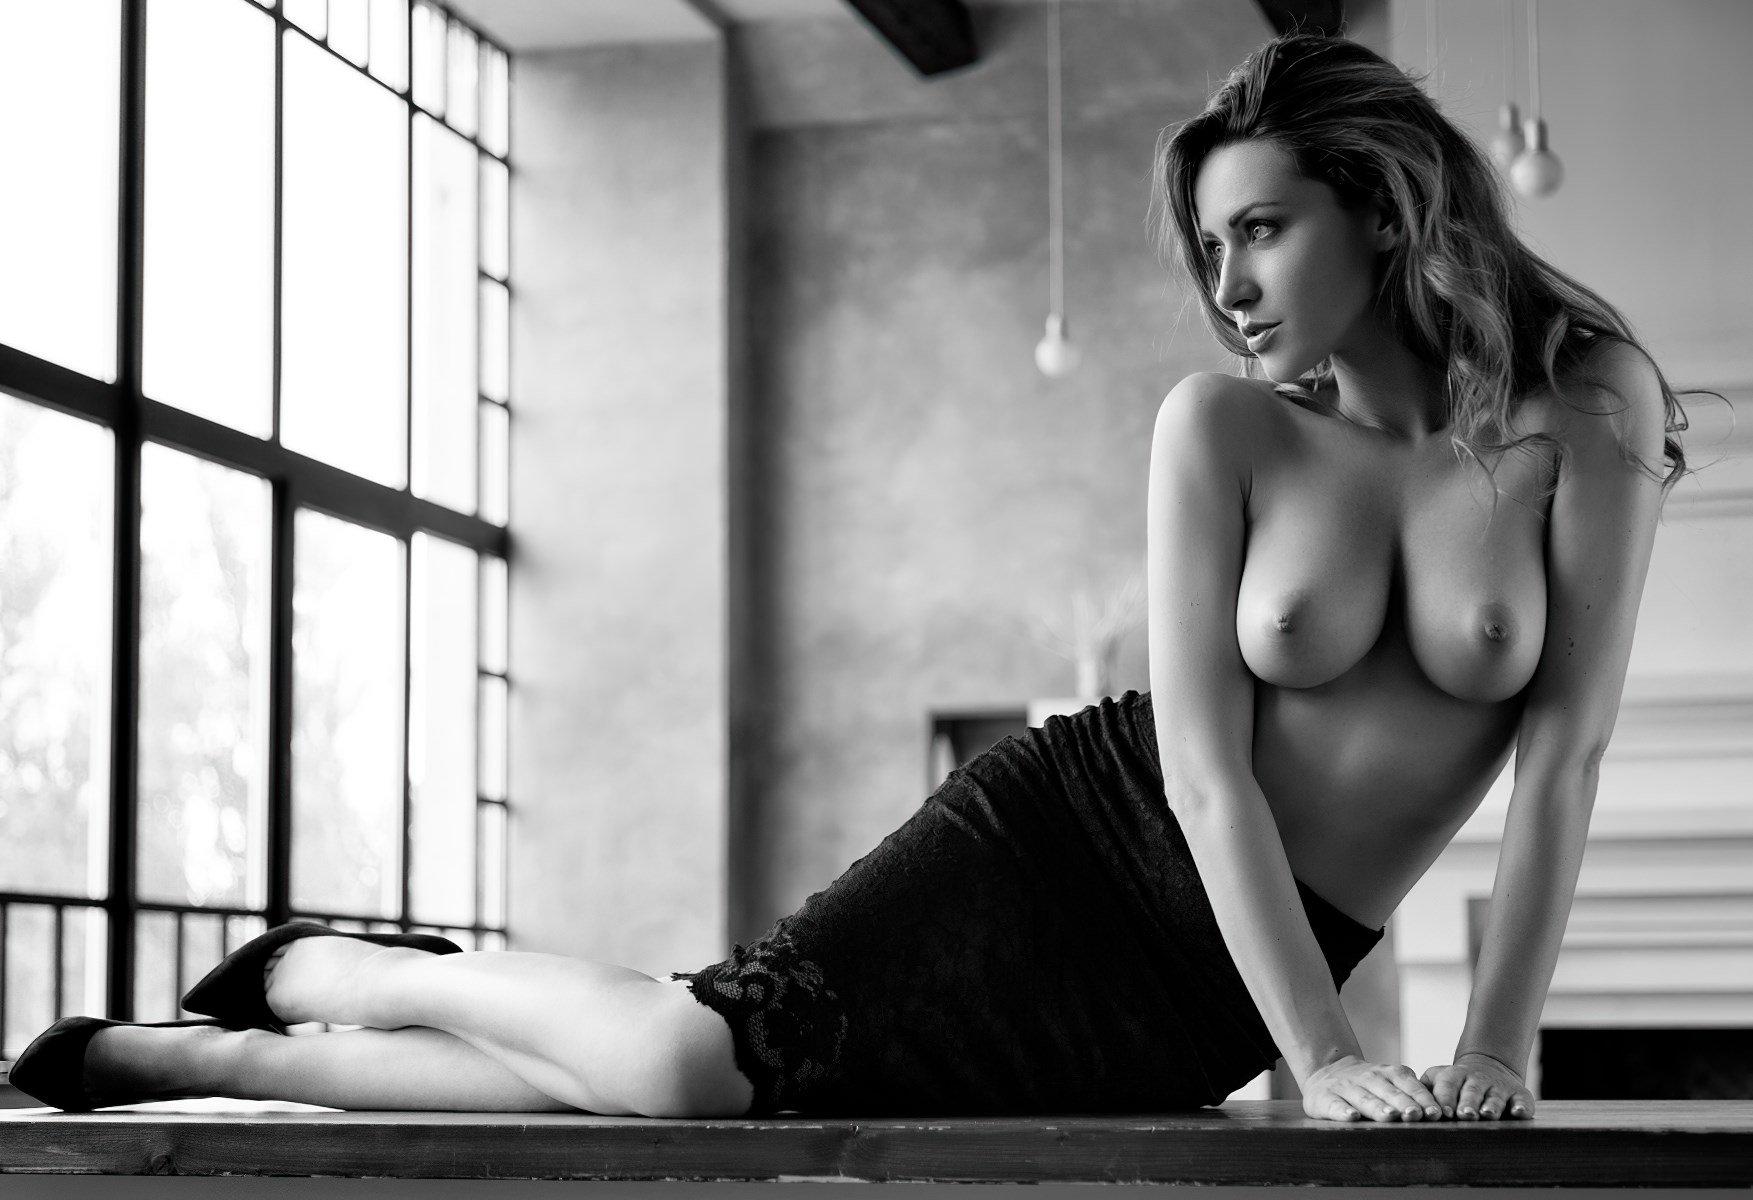 Olga Alberti Best Nude Photo Collection